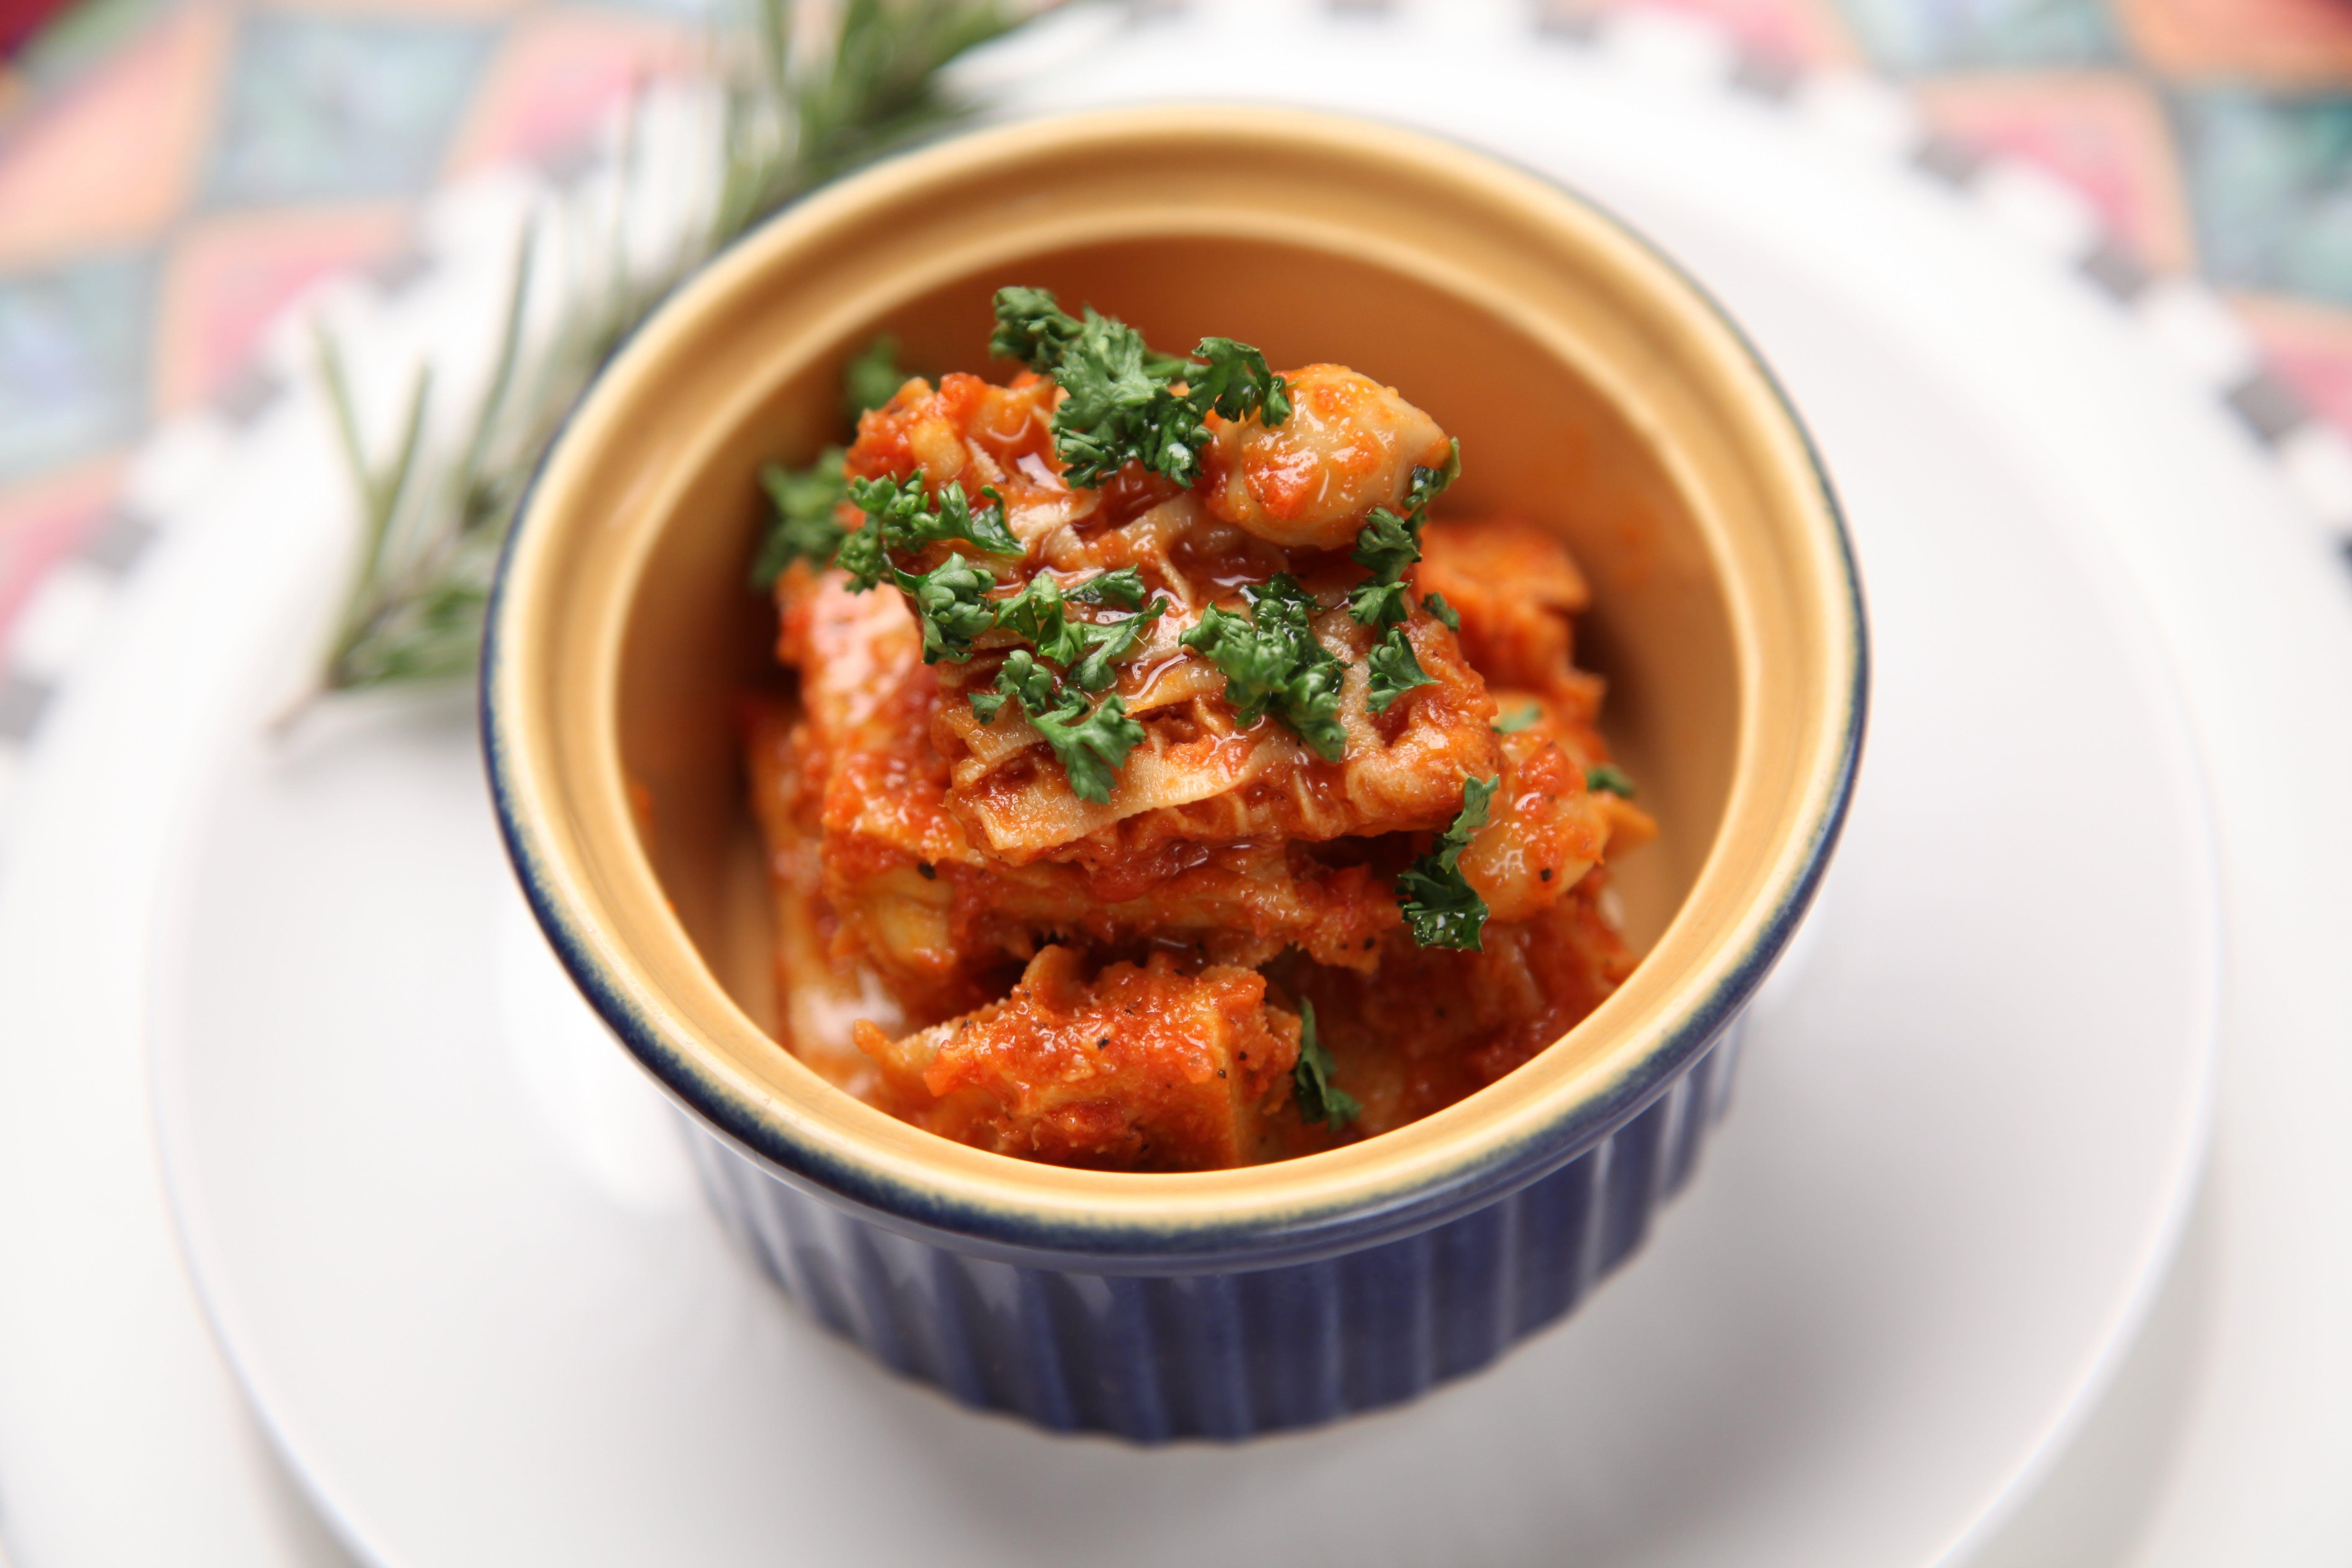 Kimchi Food in White and Blue Ramekin Bowl